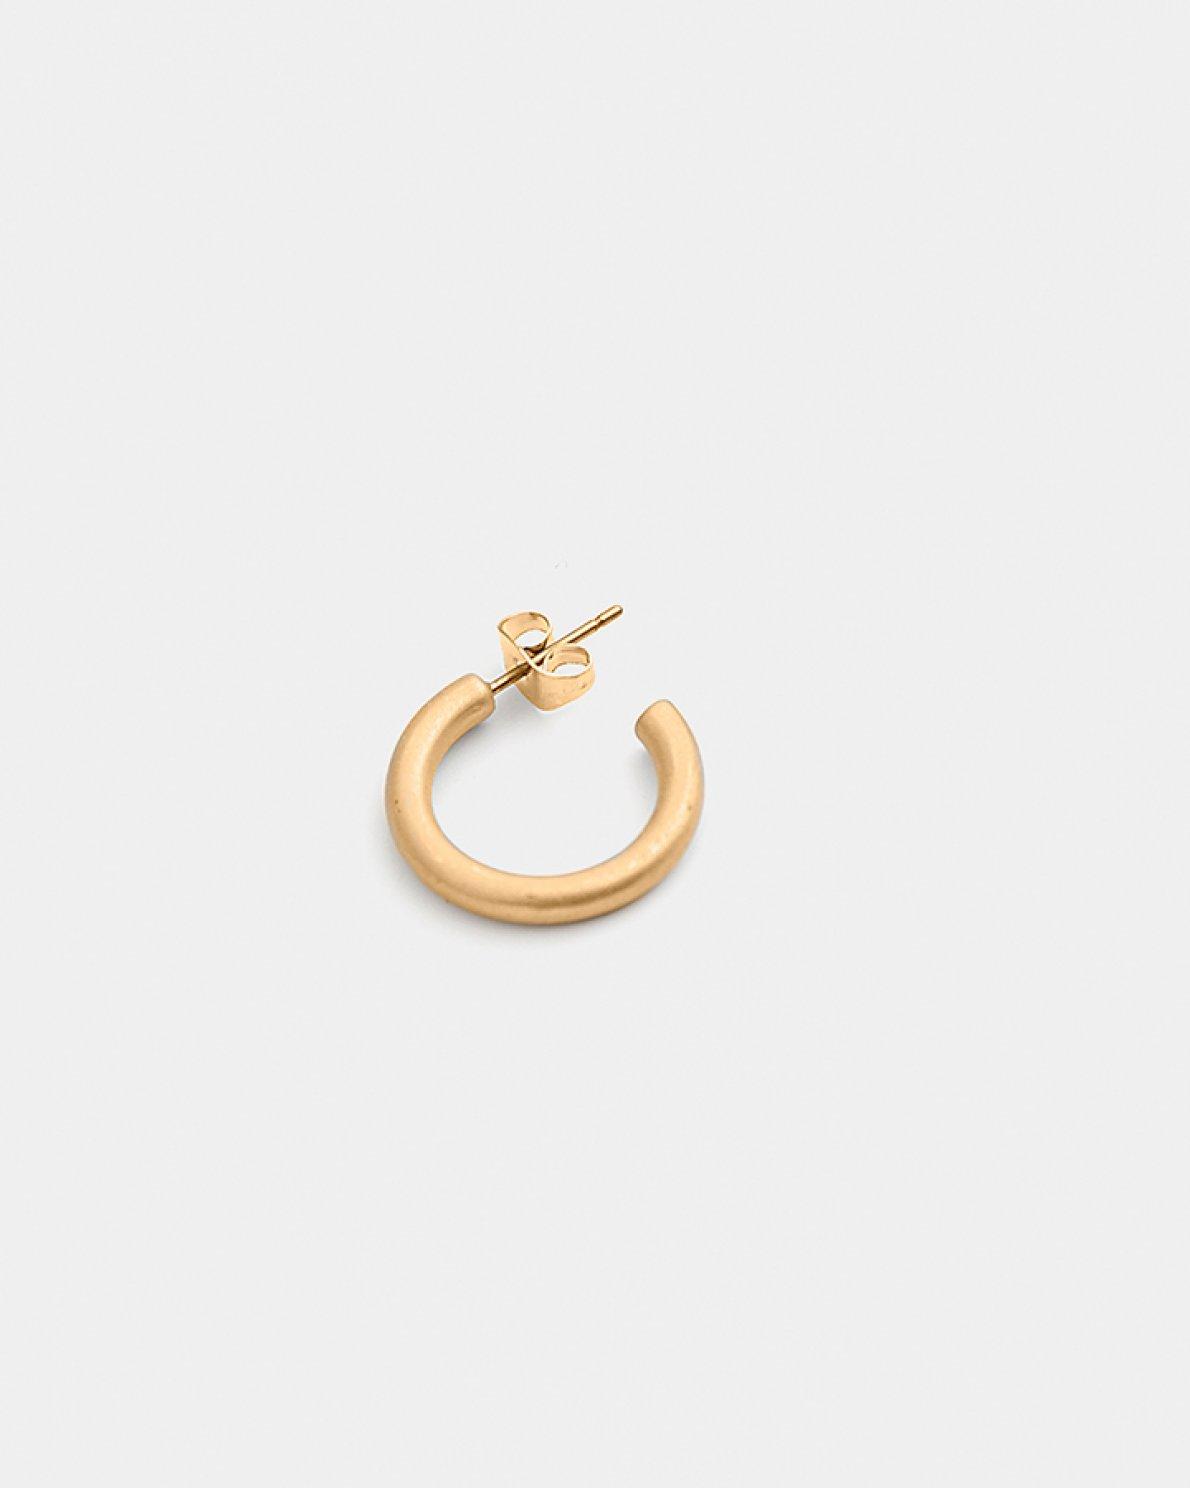 Rørig Jewellery - Moss Copenhagen - Sally Creol Earring WO-53